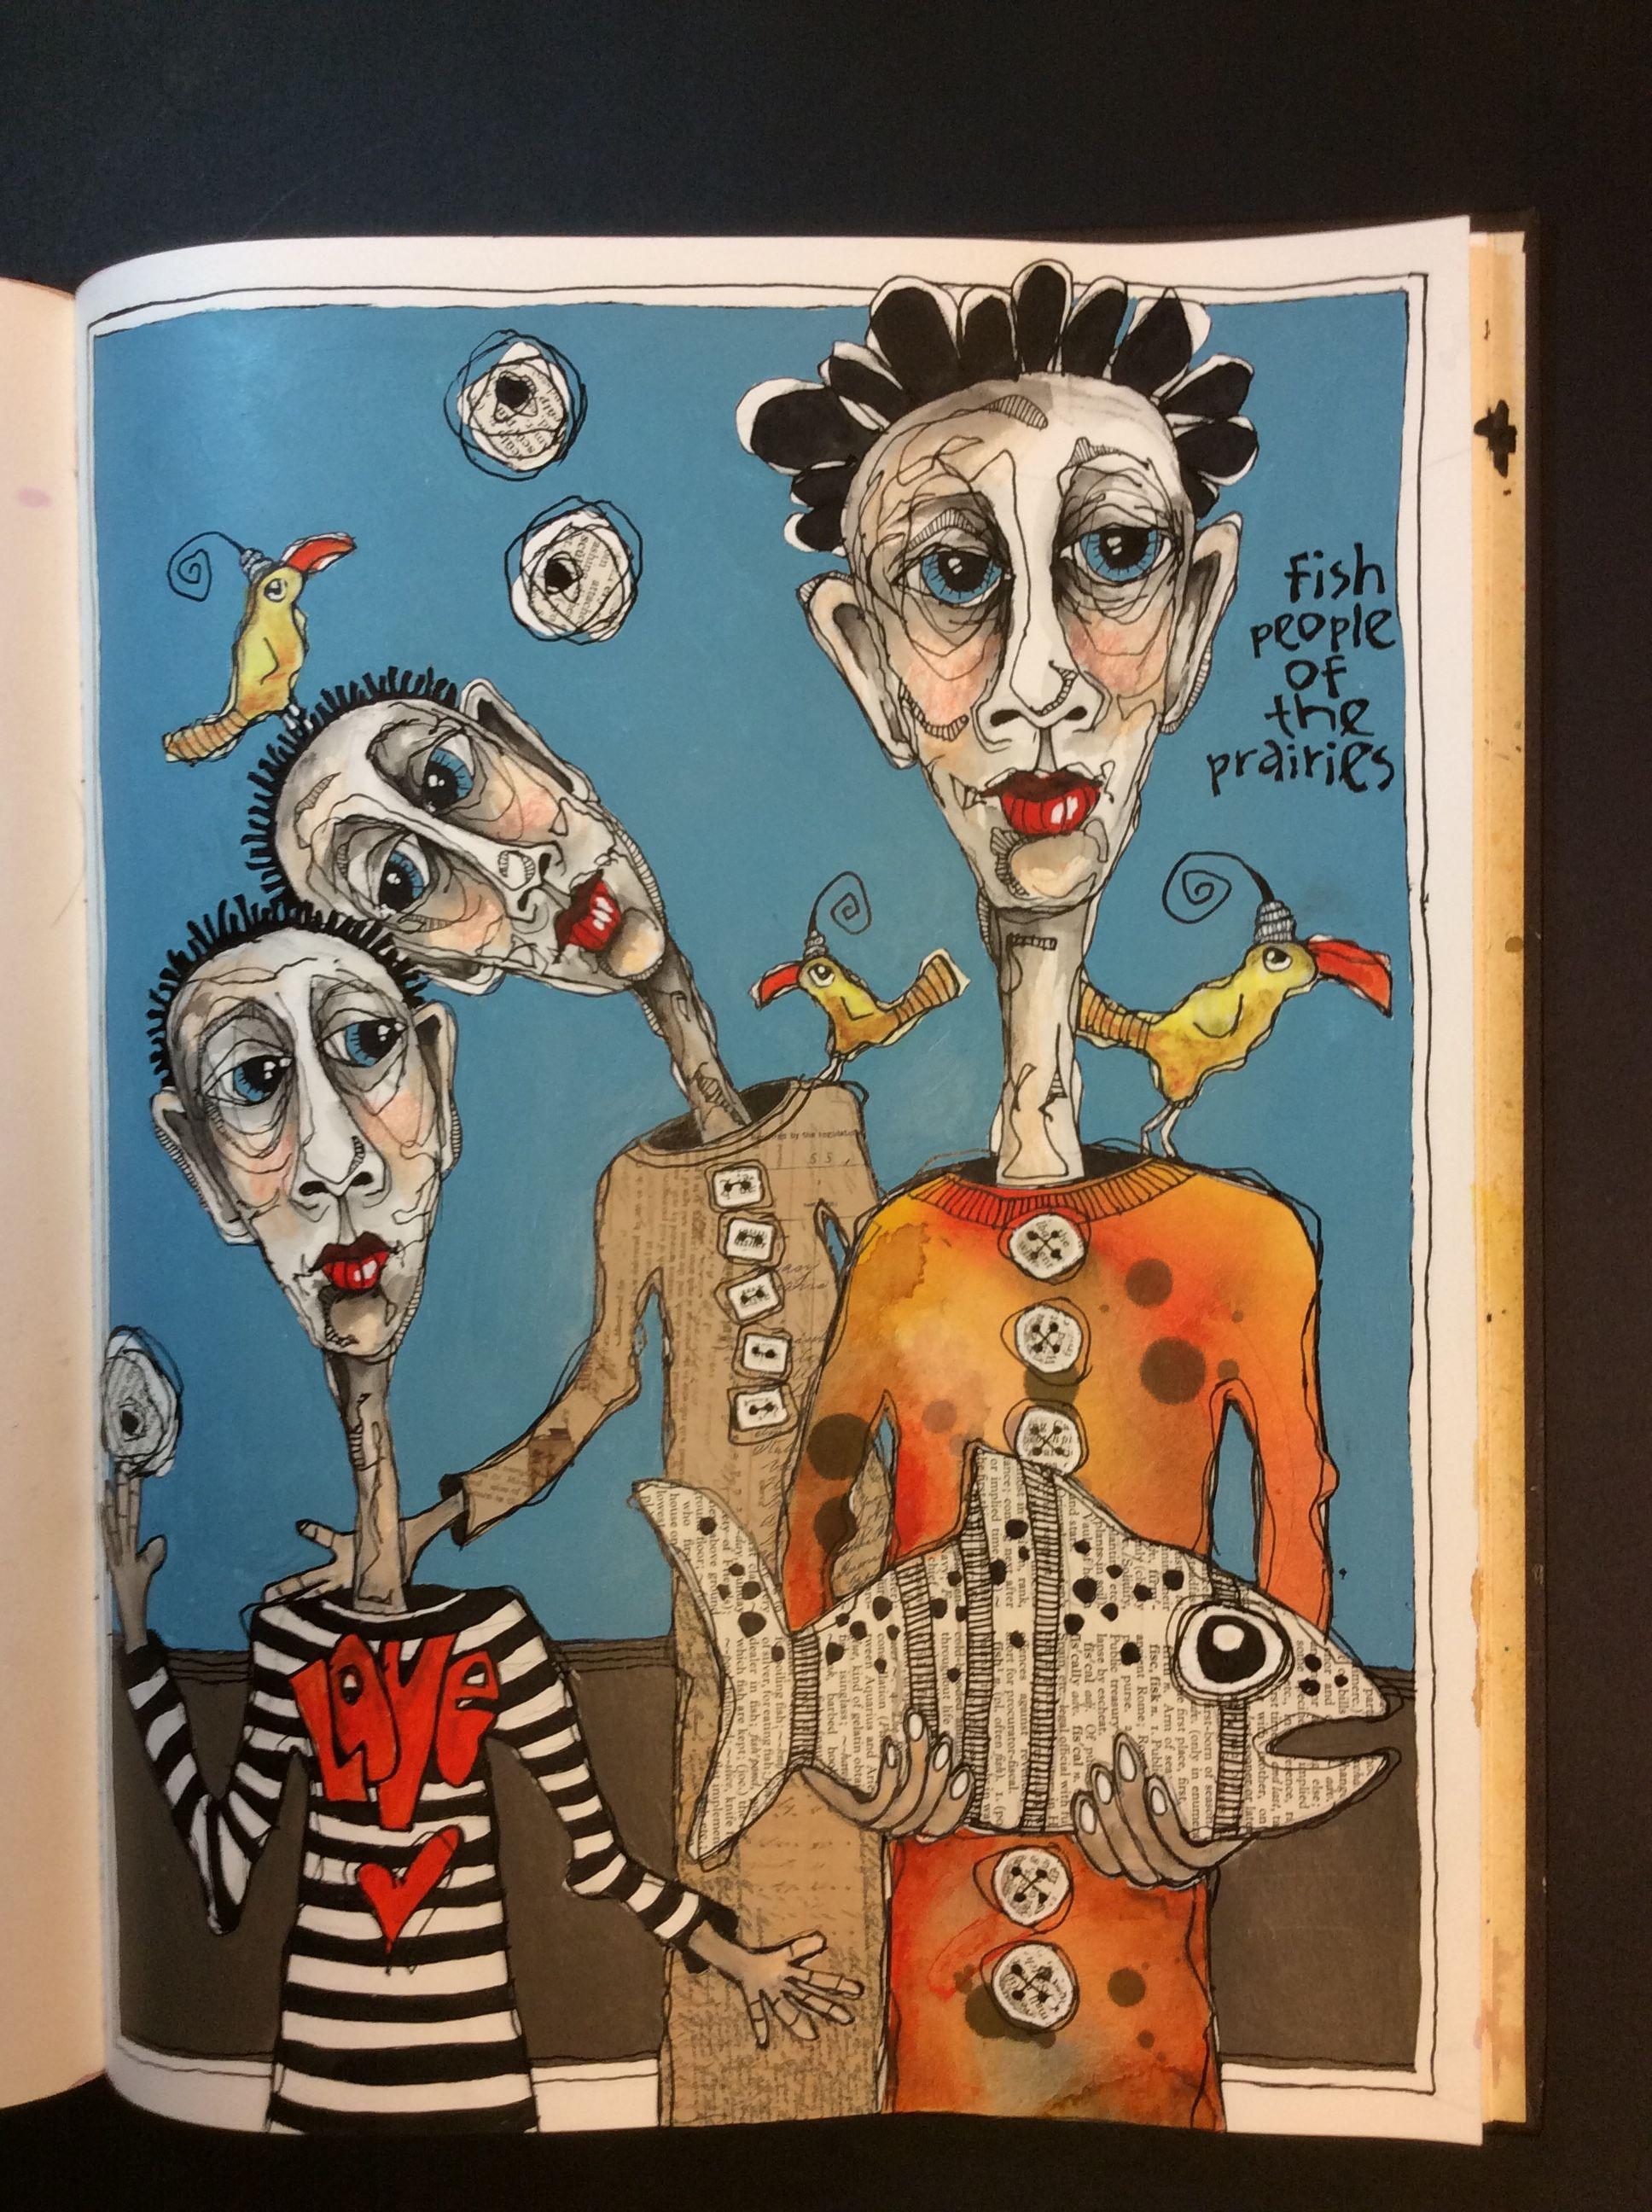 Felix murillo lleno de colores painting acrylic artwork fish art - Deb Weiers Fish People Of The Prairies Sold Funky Artbeautiful Paintingsmoleskineart